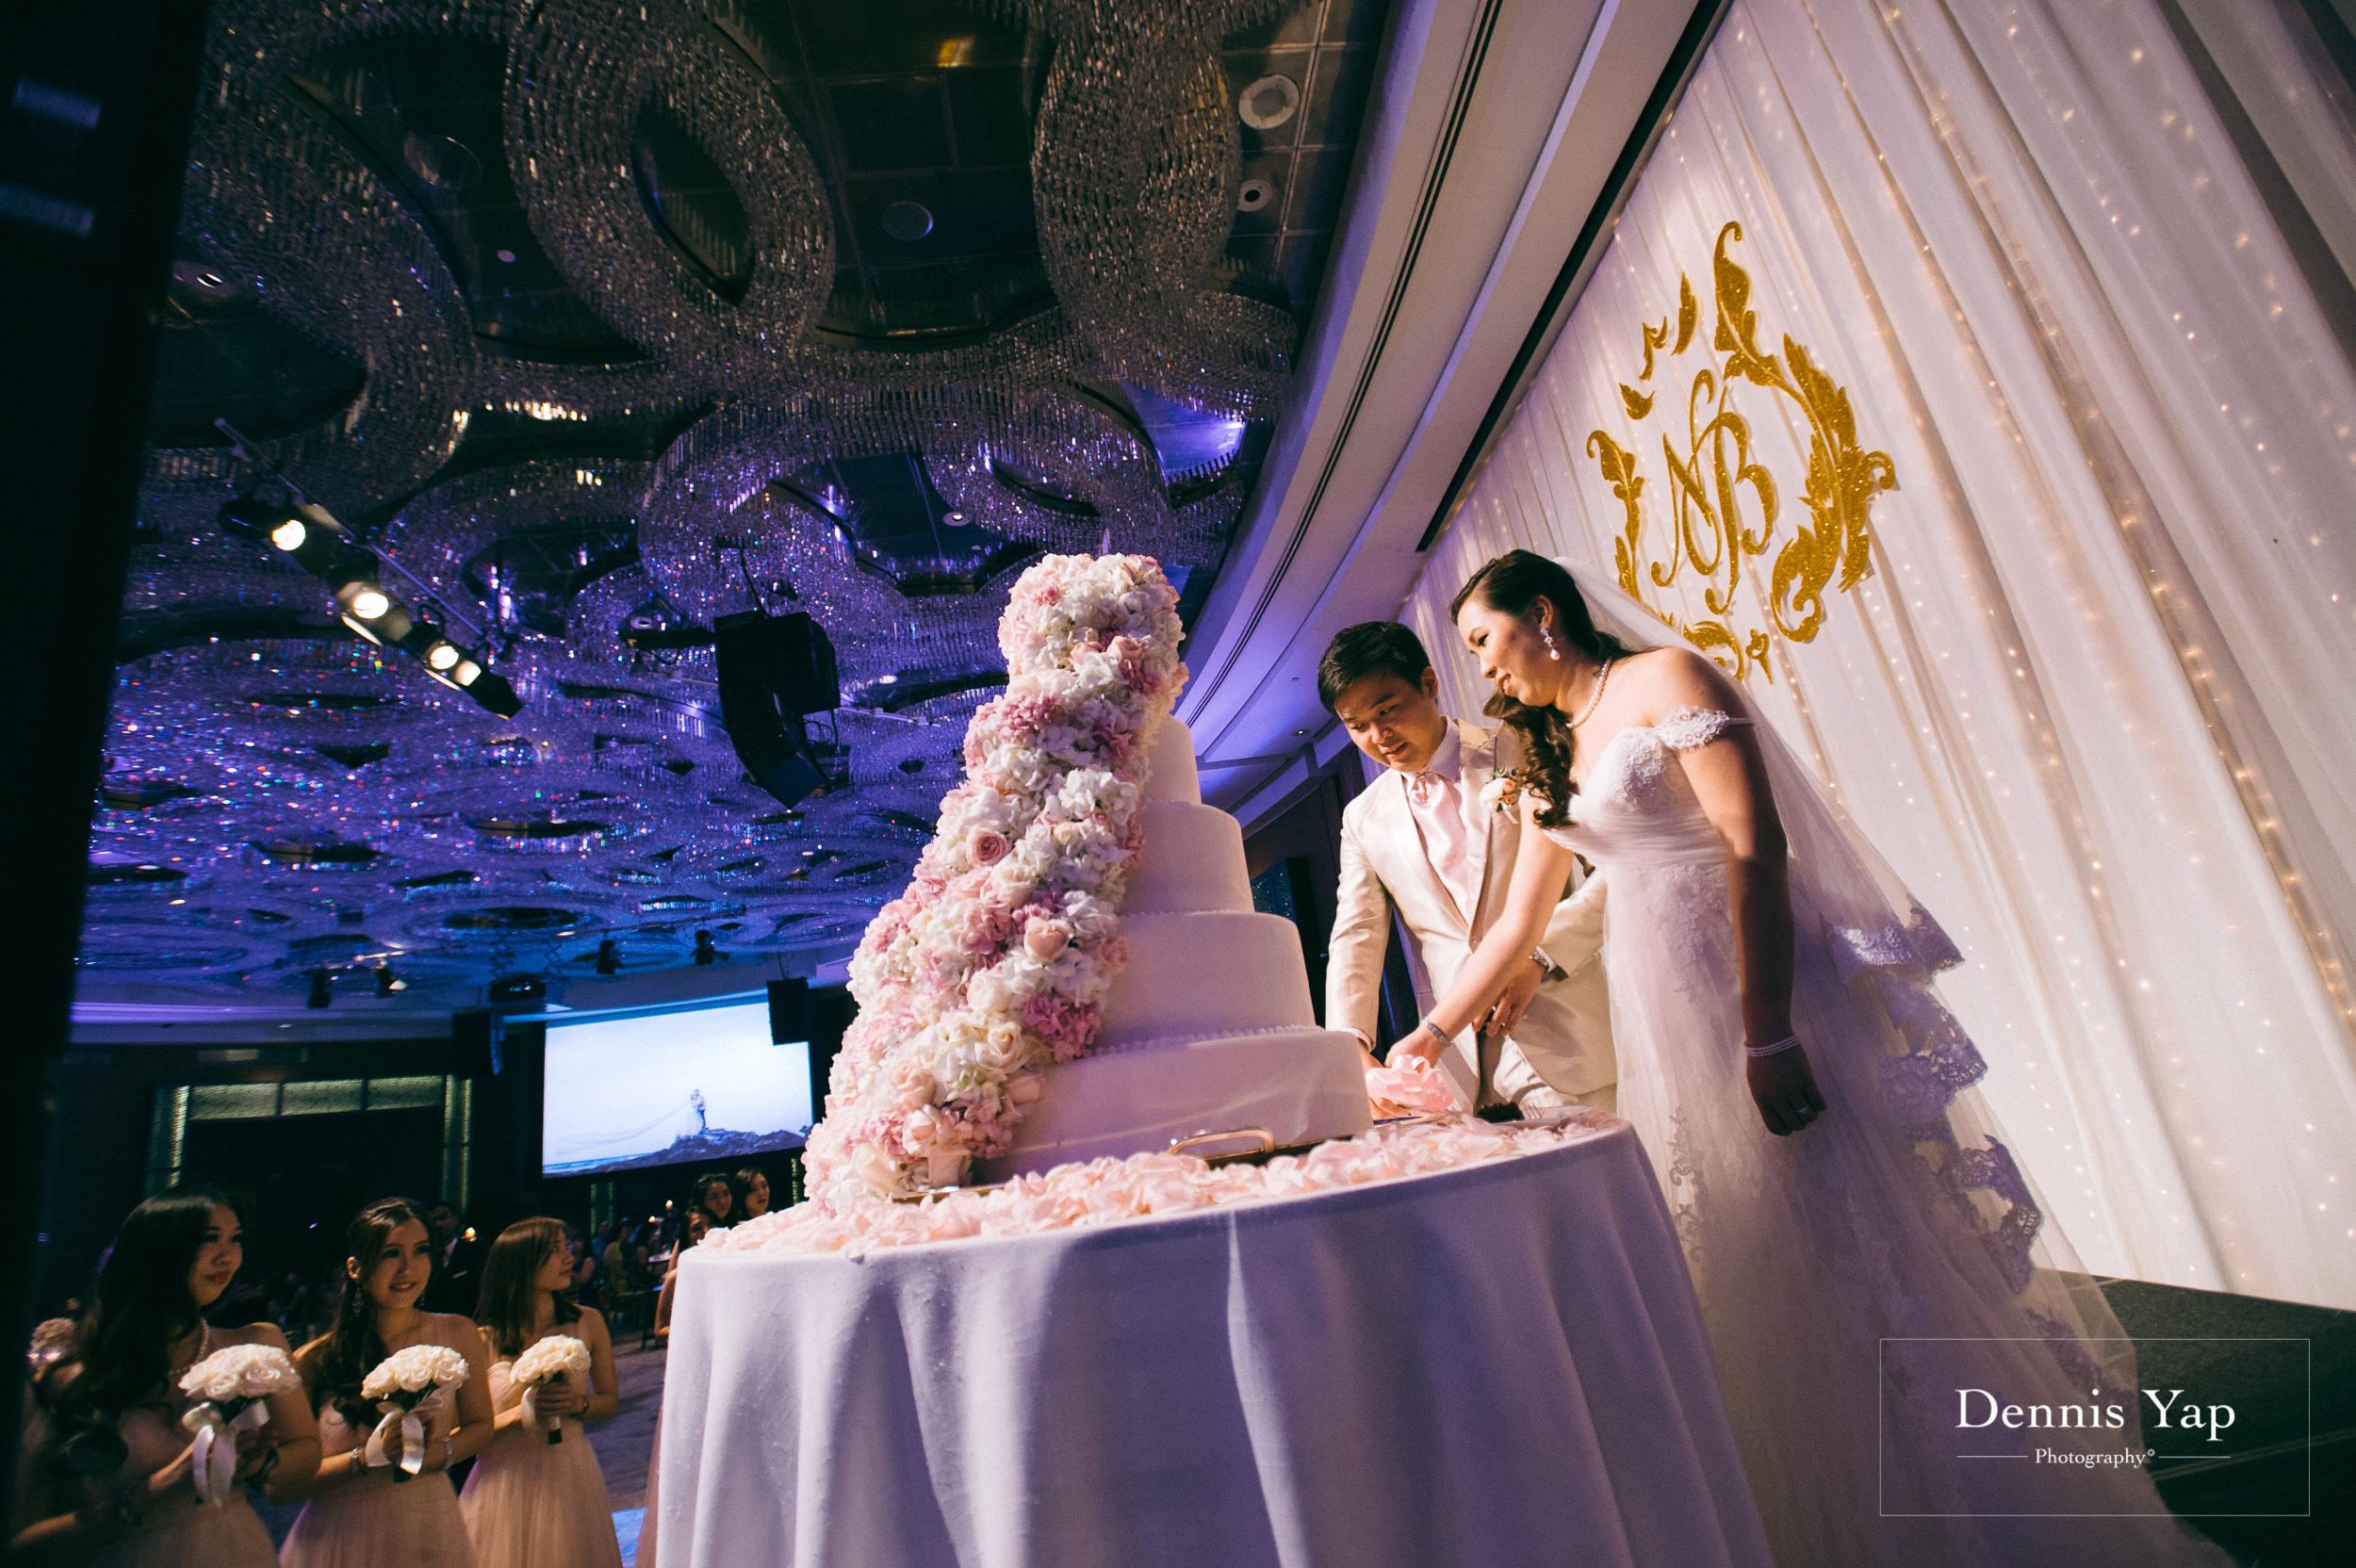 nelson bee yi wedding banquet grand hyatt kuala lumpur dennis yap photography jovita lo wedding-6.jpg